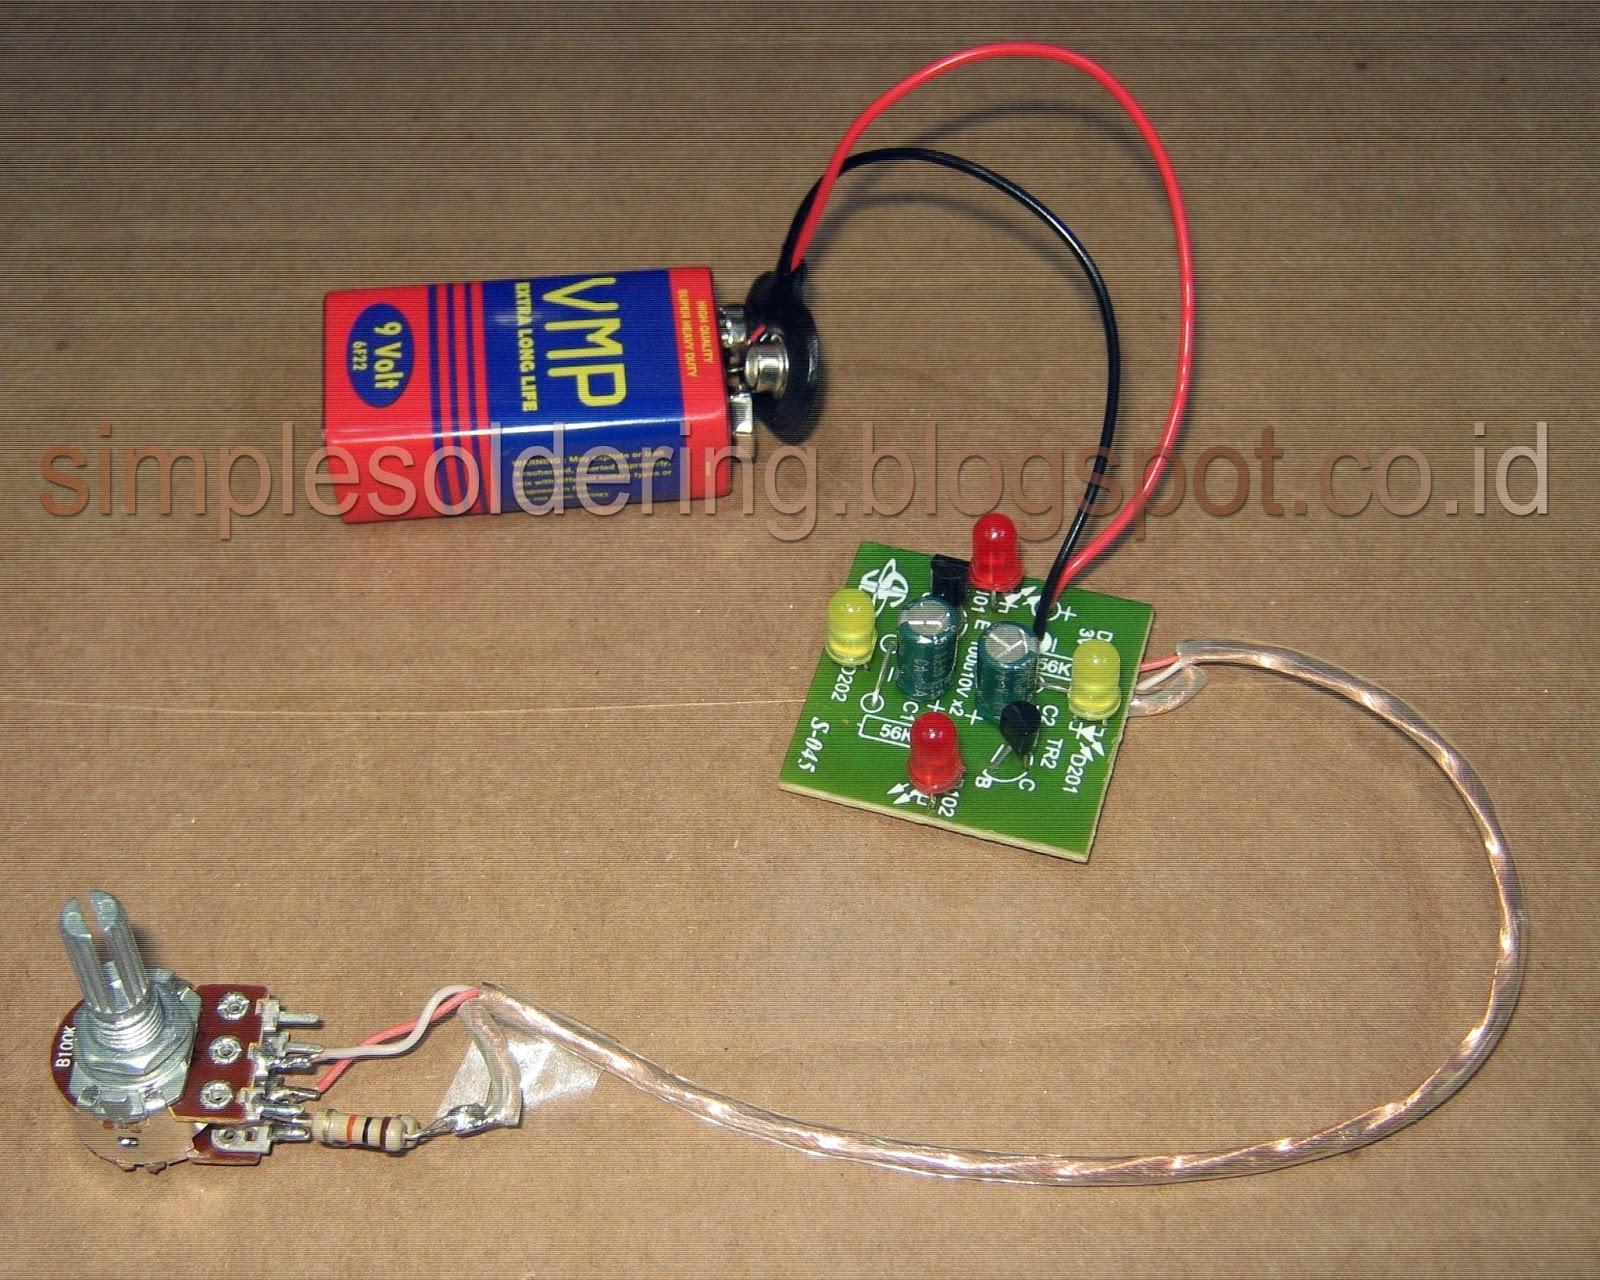 Led Flasher Circuit Flip Flop 2 Ledandlightcircuit Circuit